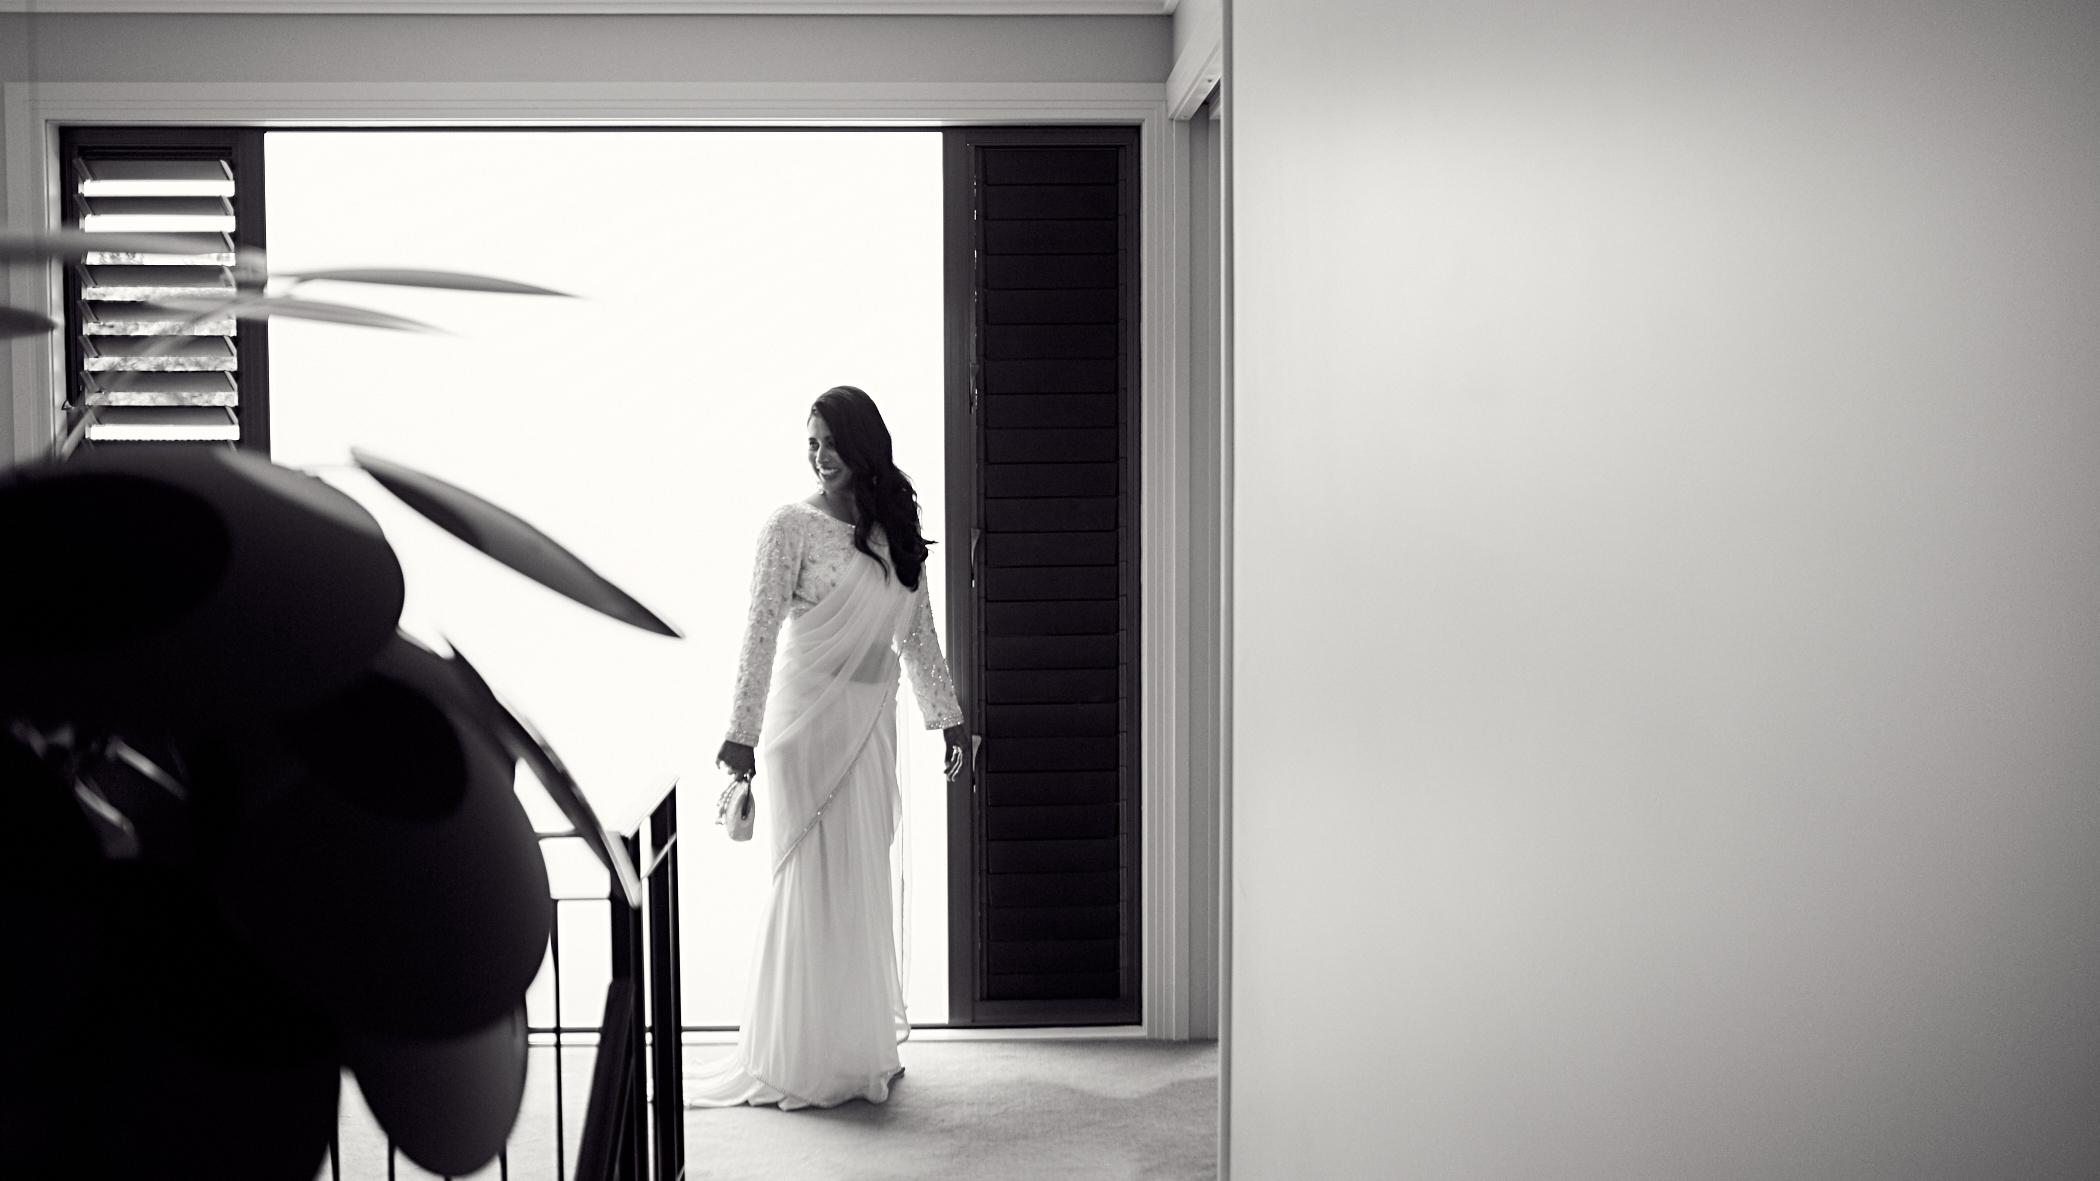 creative shot of bride